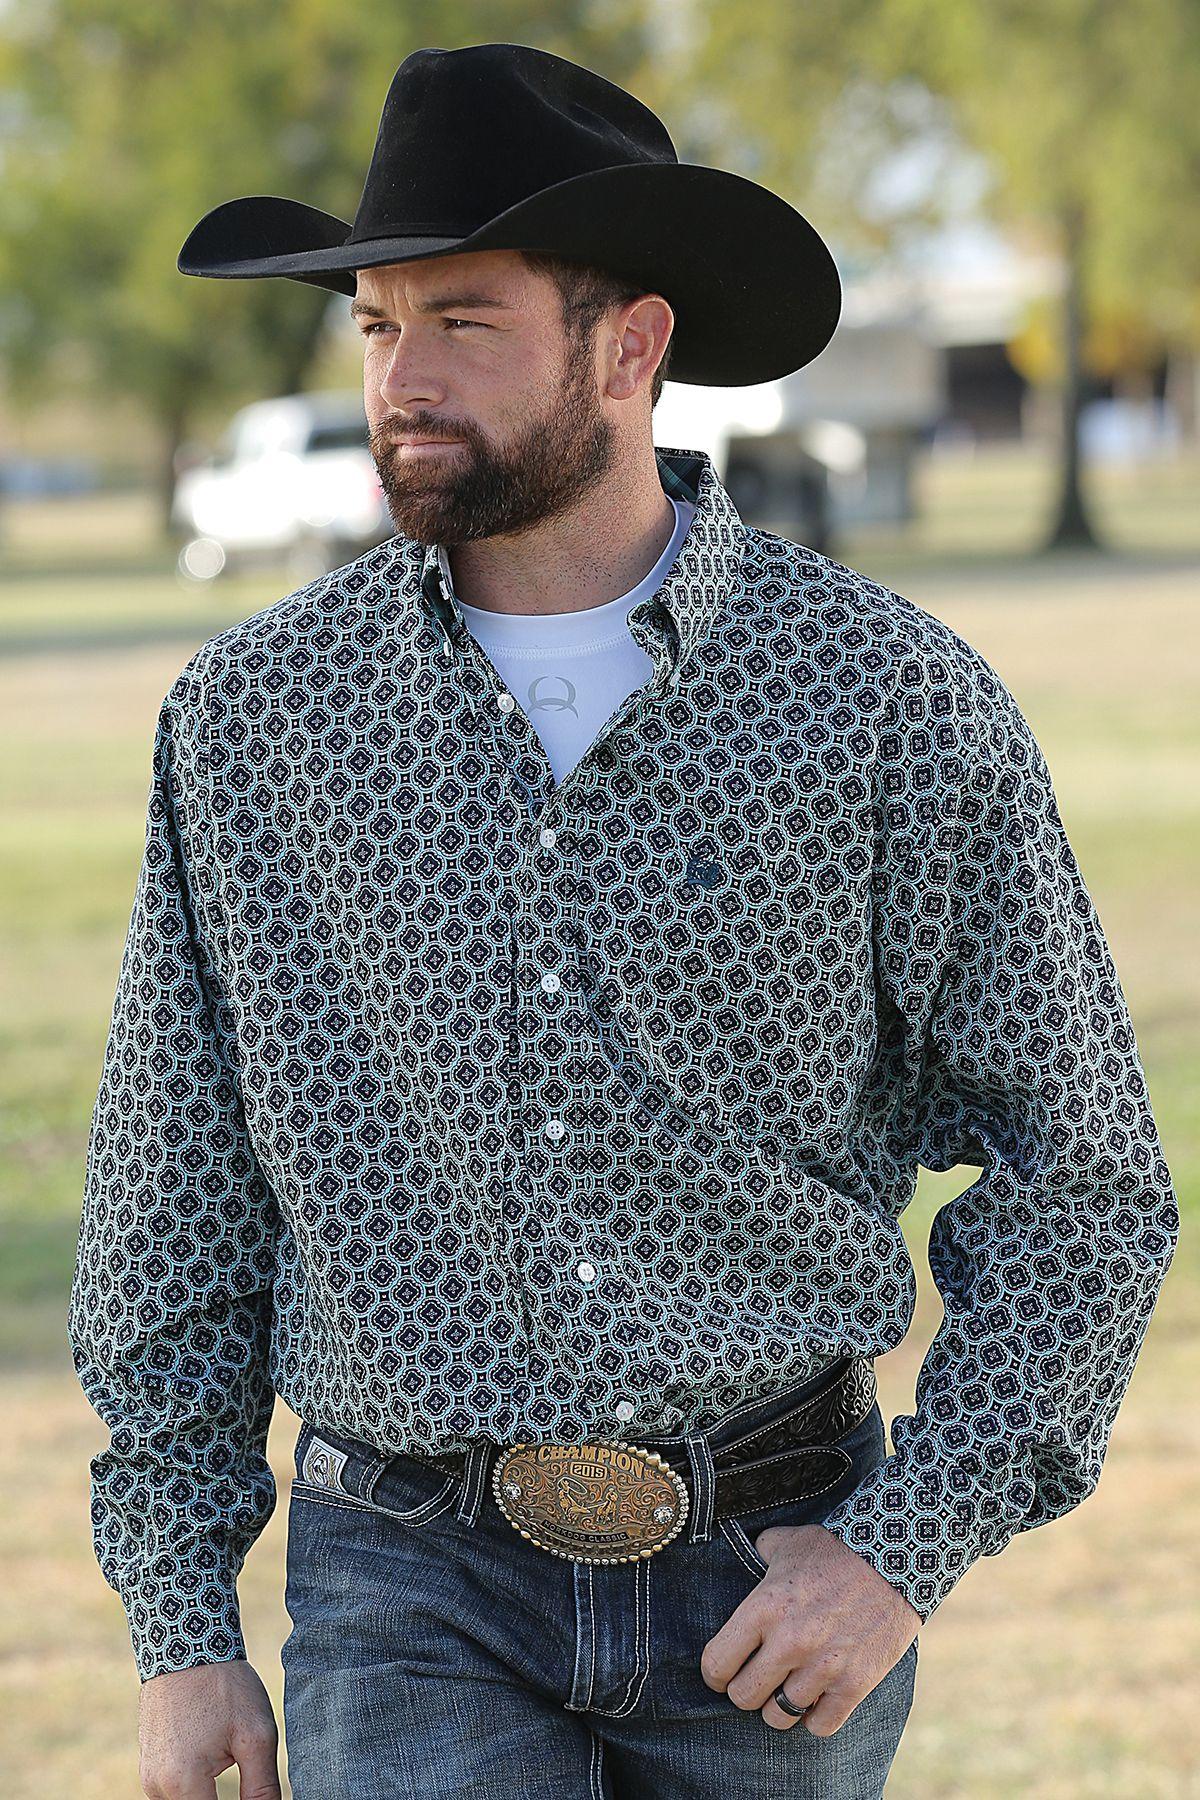 Cinch Button Down  Cinch Shirts from Wheelersfeed.com  Cowboy